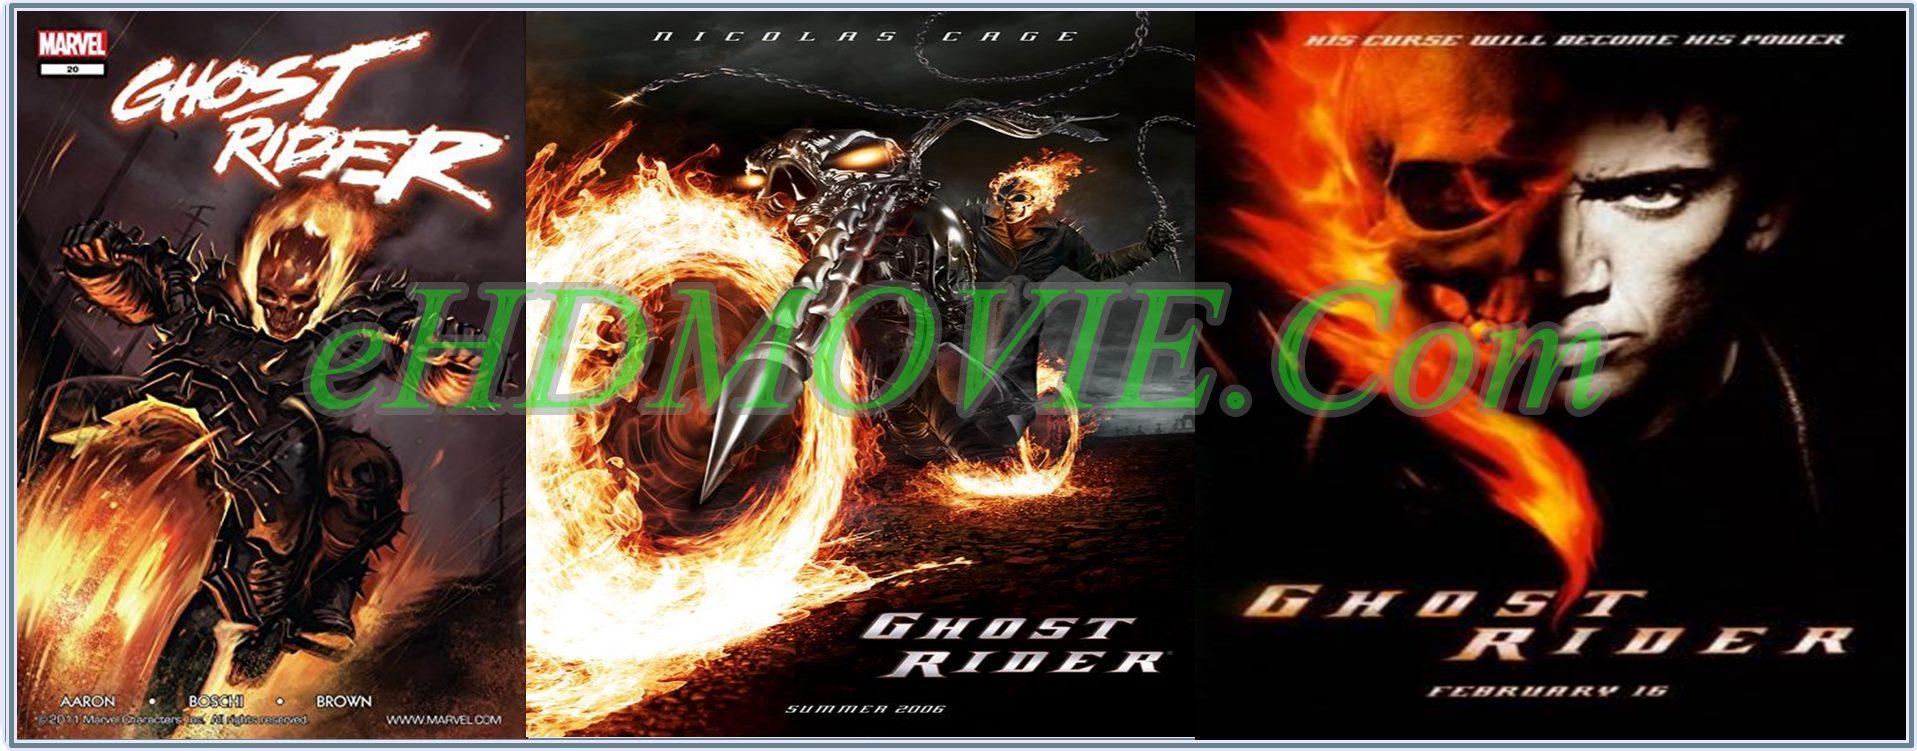 Ghost Rider 2007 Full Movie Dual Audio [Hindi – English] 720p - 480p ORG BRRip 400MB - 950MB ESubs Free Download